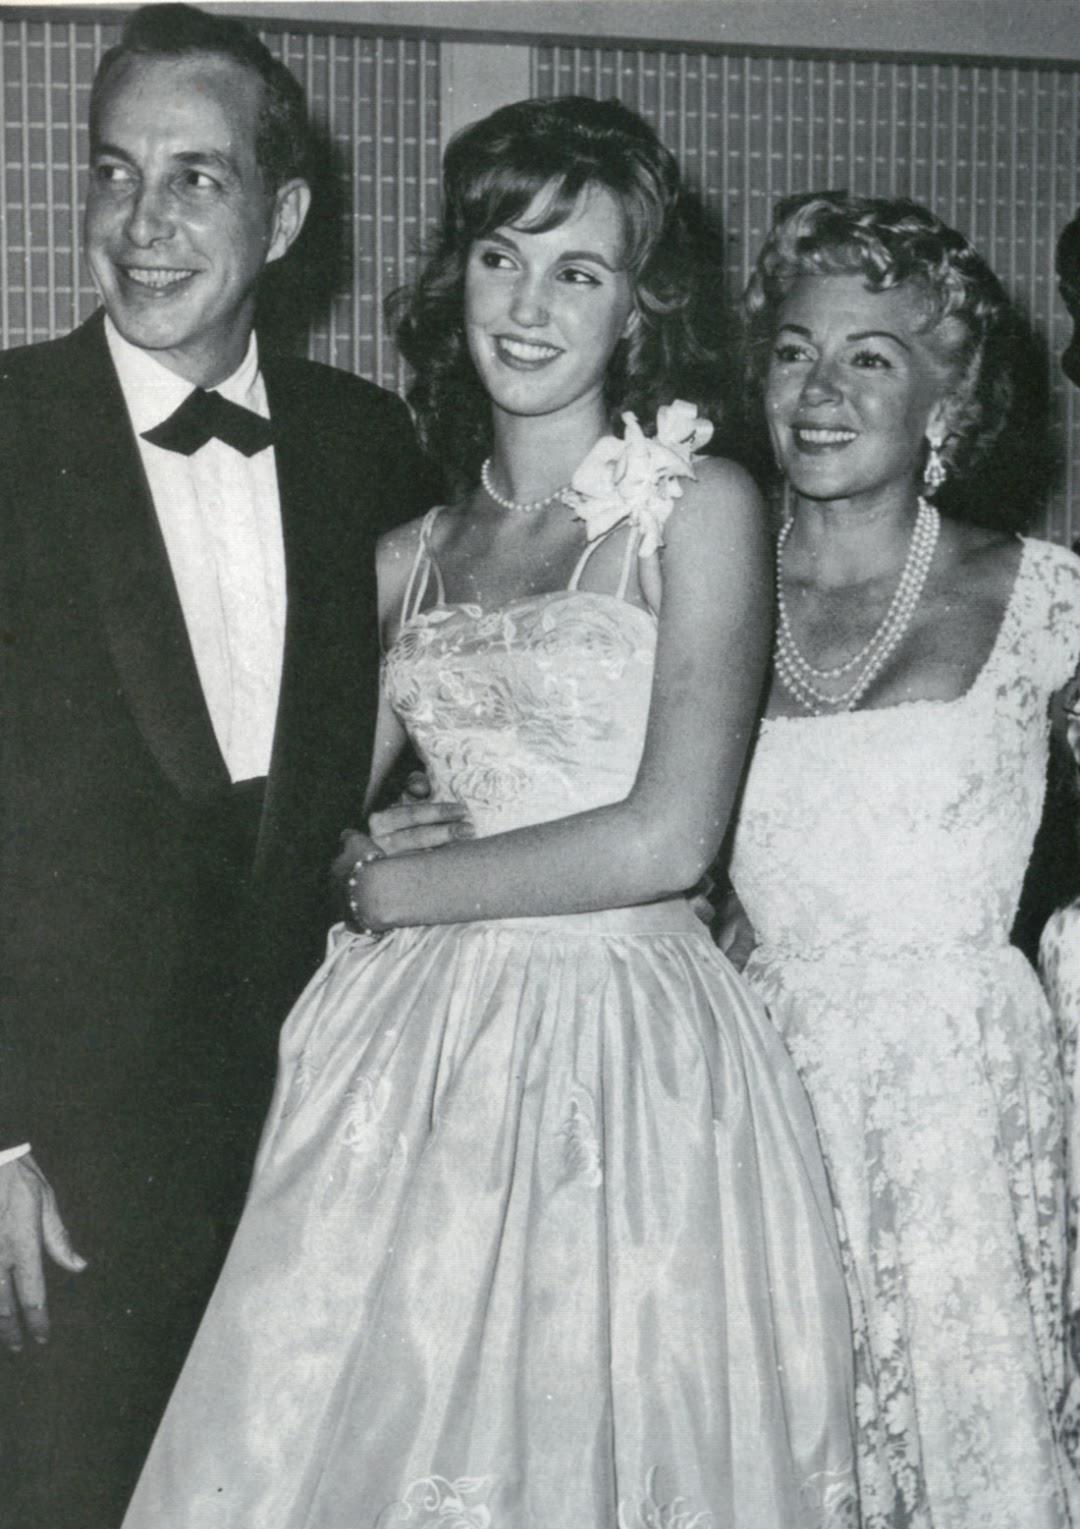 Lana Turner, Stephen Crane, and Cheryl Crane